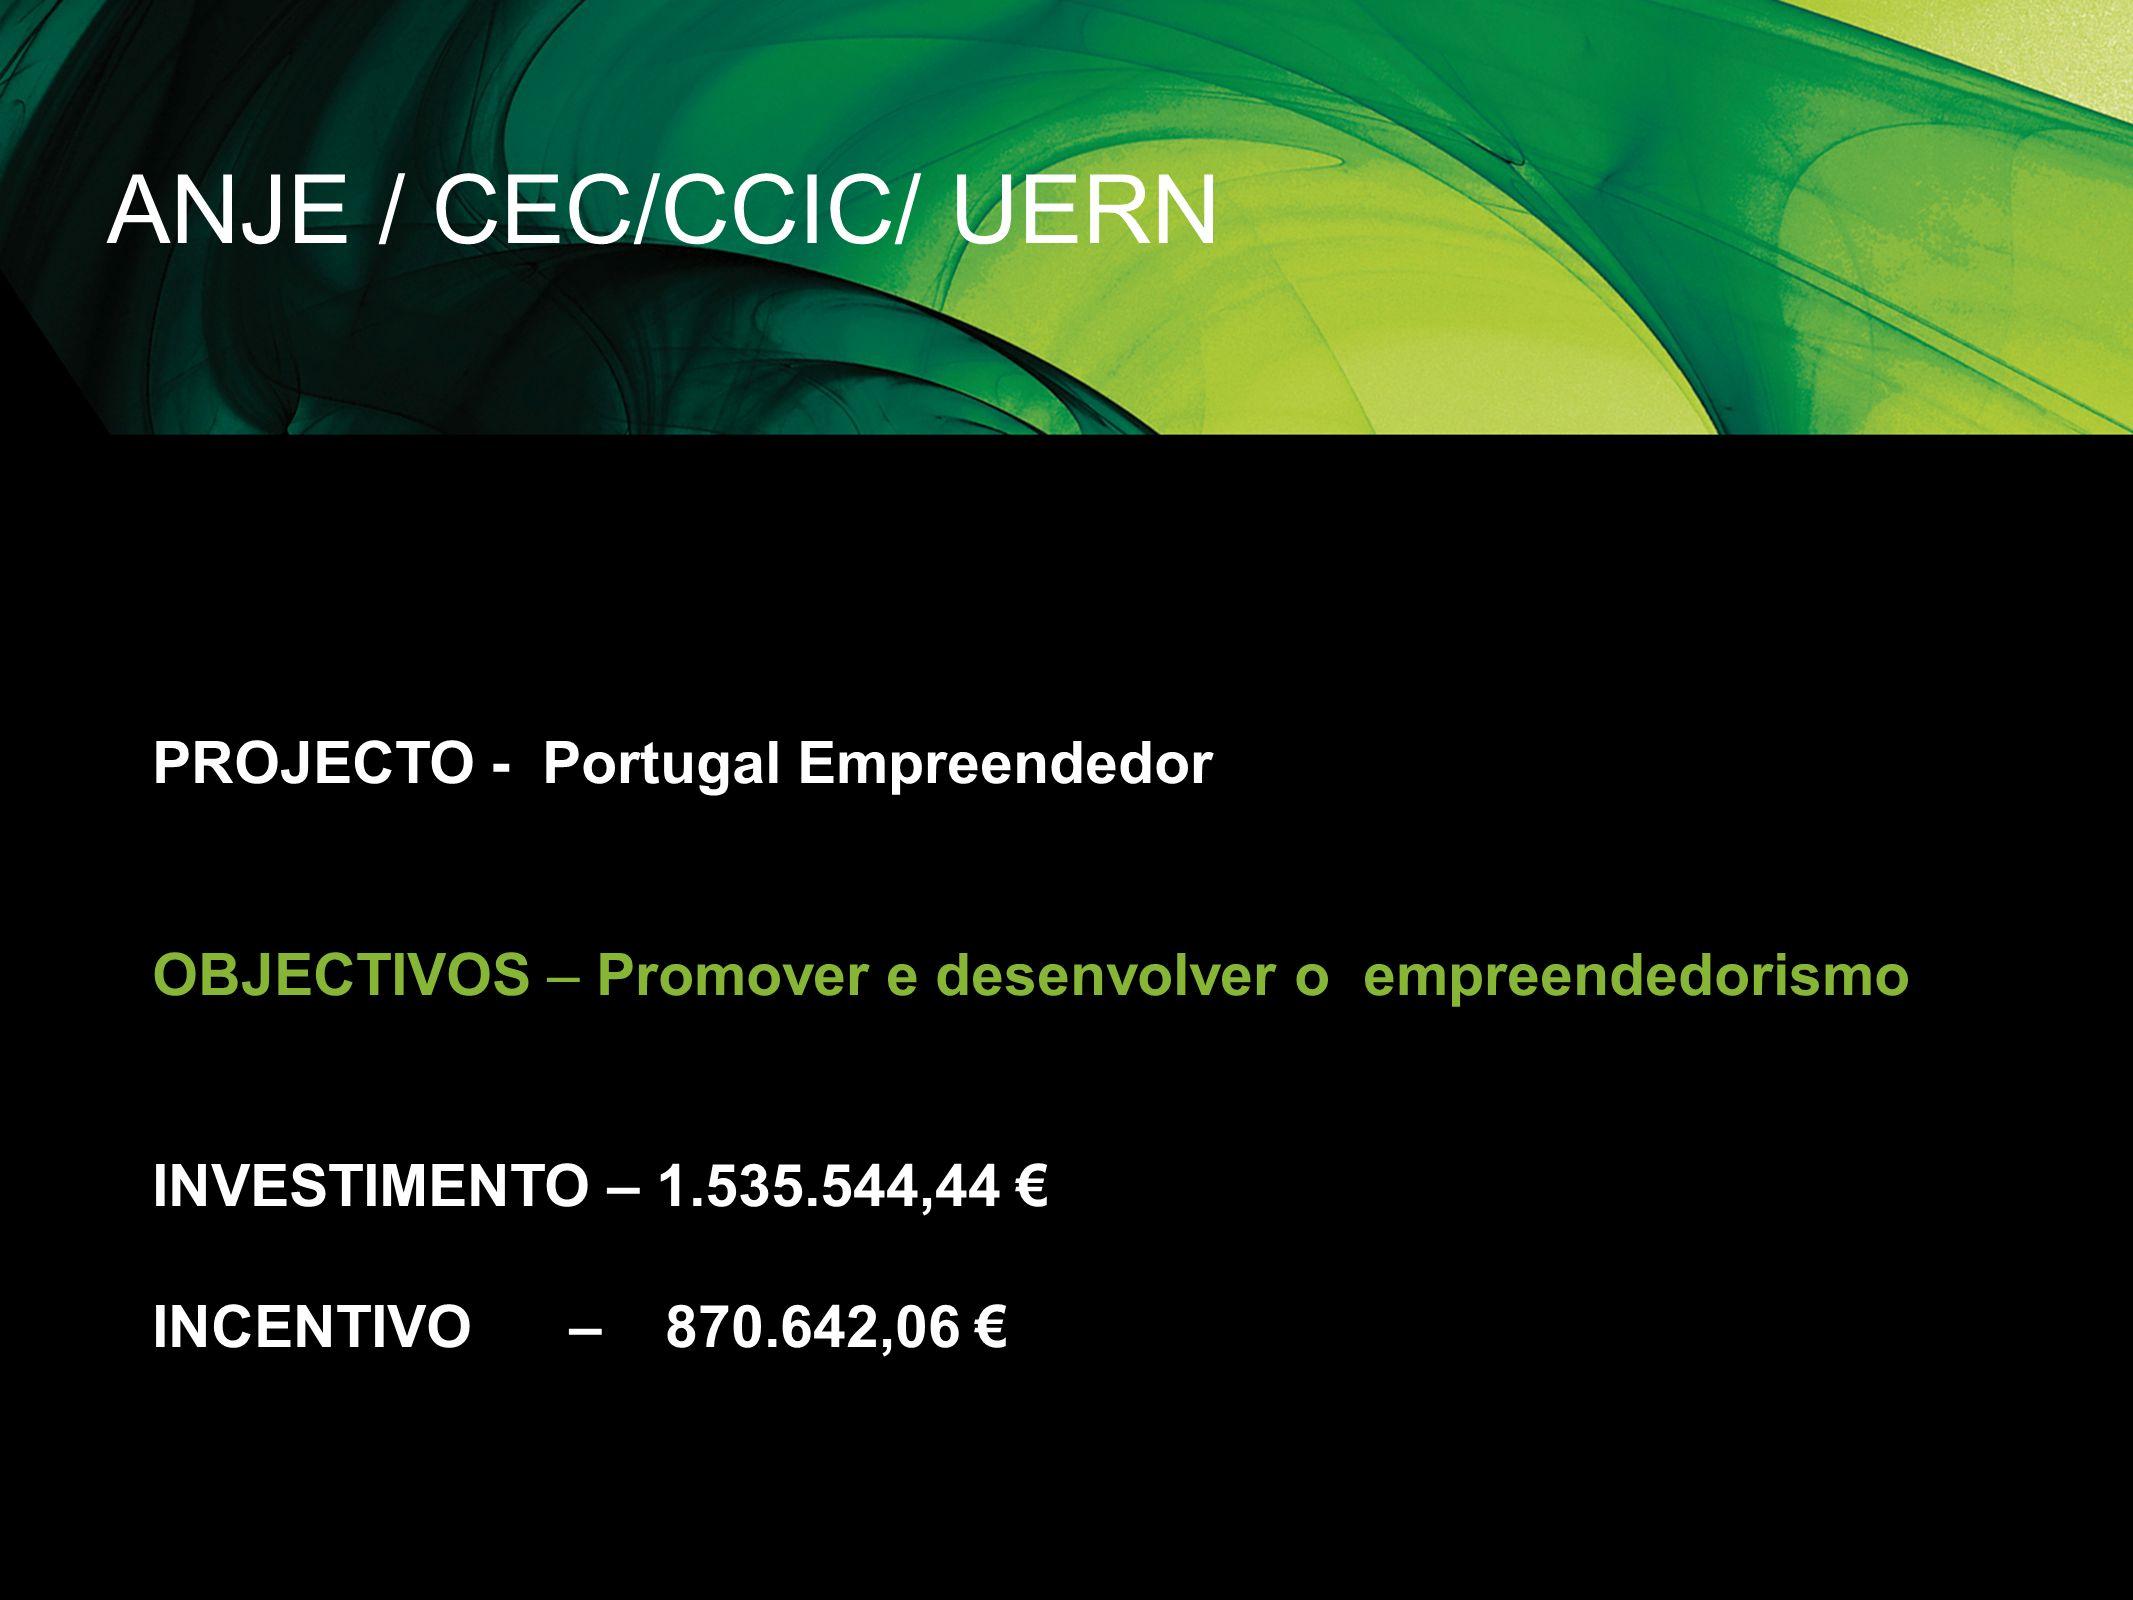 ANJE / CEC/CCIC/ UERN PROJECTO - Portugal Empreendedor